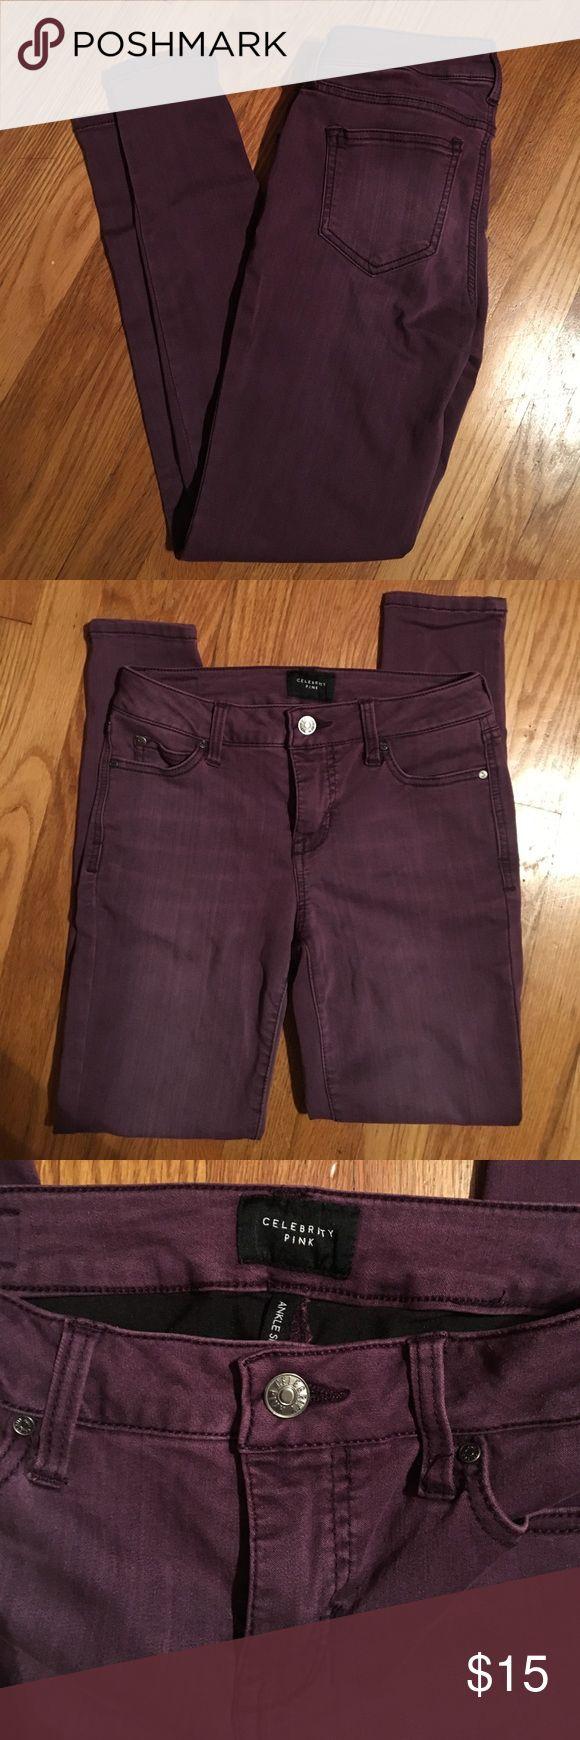 Purple skinny jeans Stretchy purple skinny jeans. Worn once. Celebrity Pink Jeans Skinny